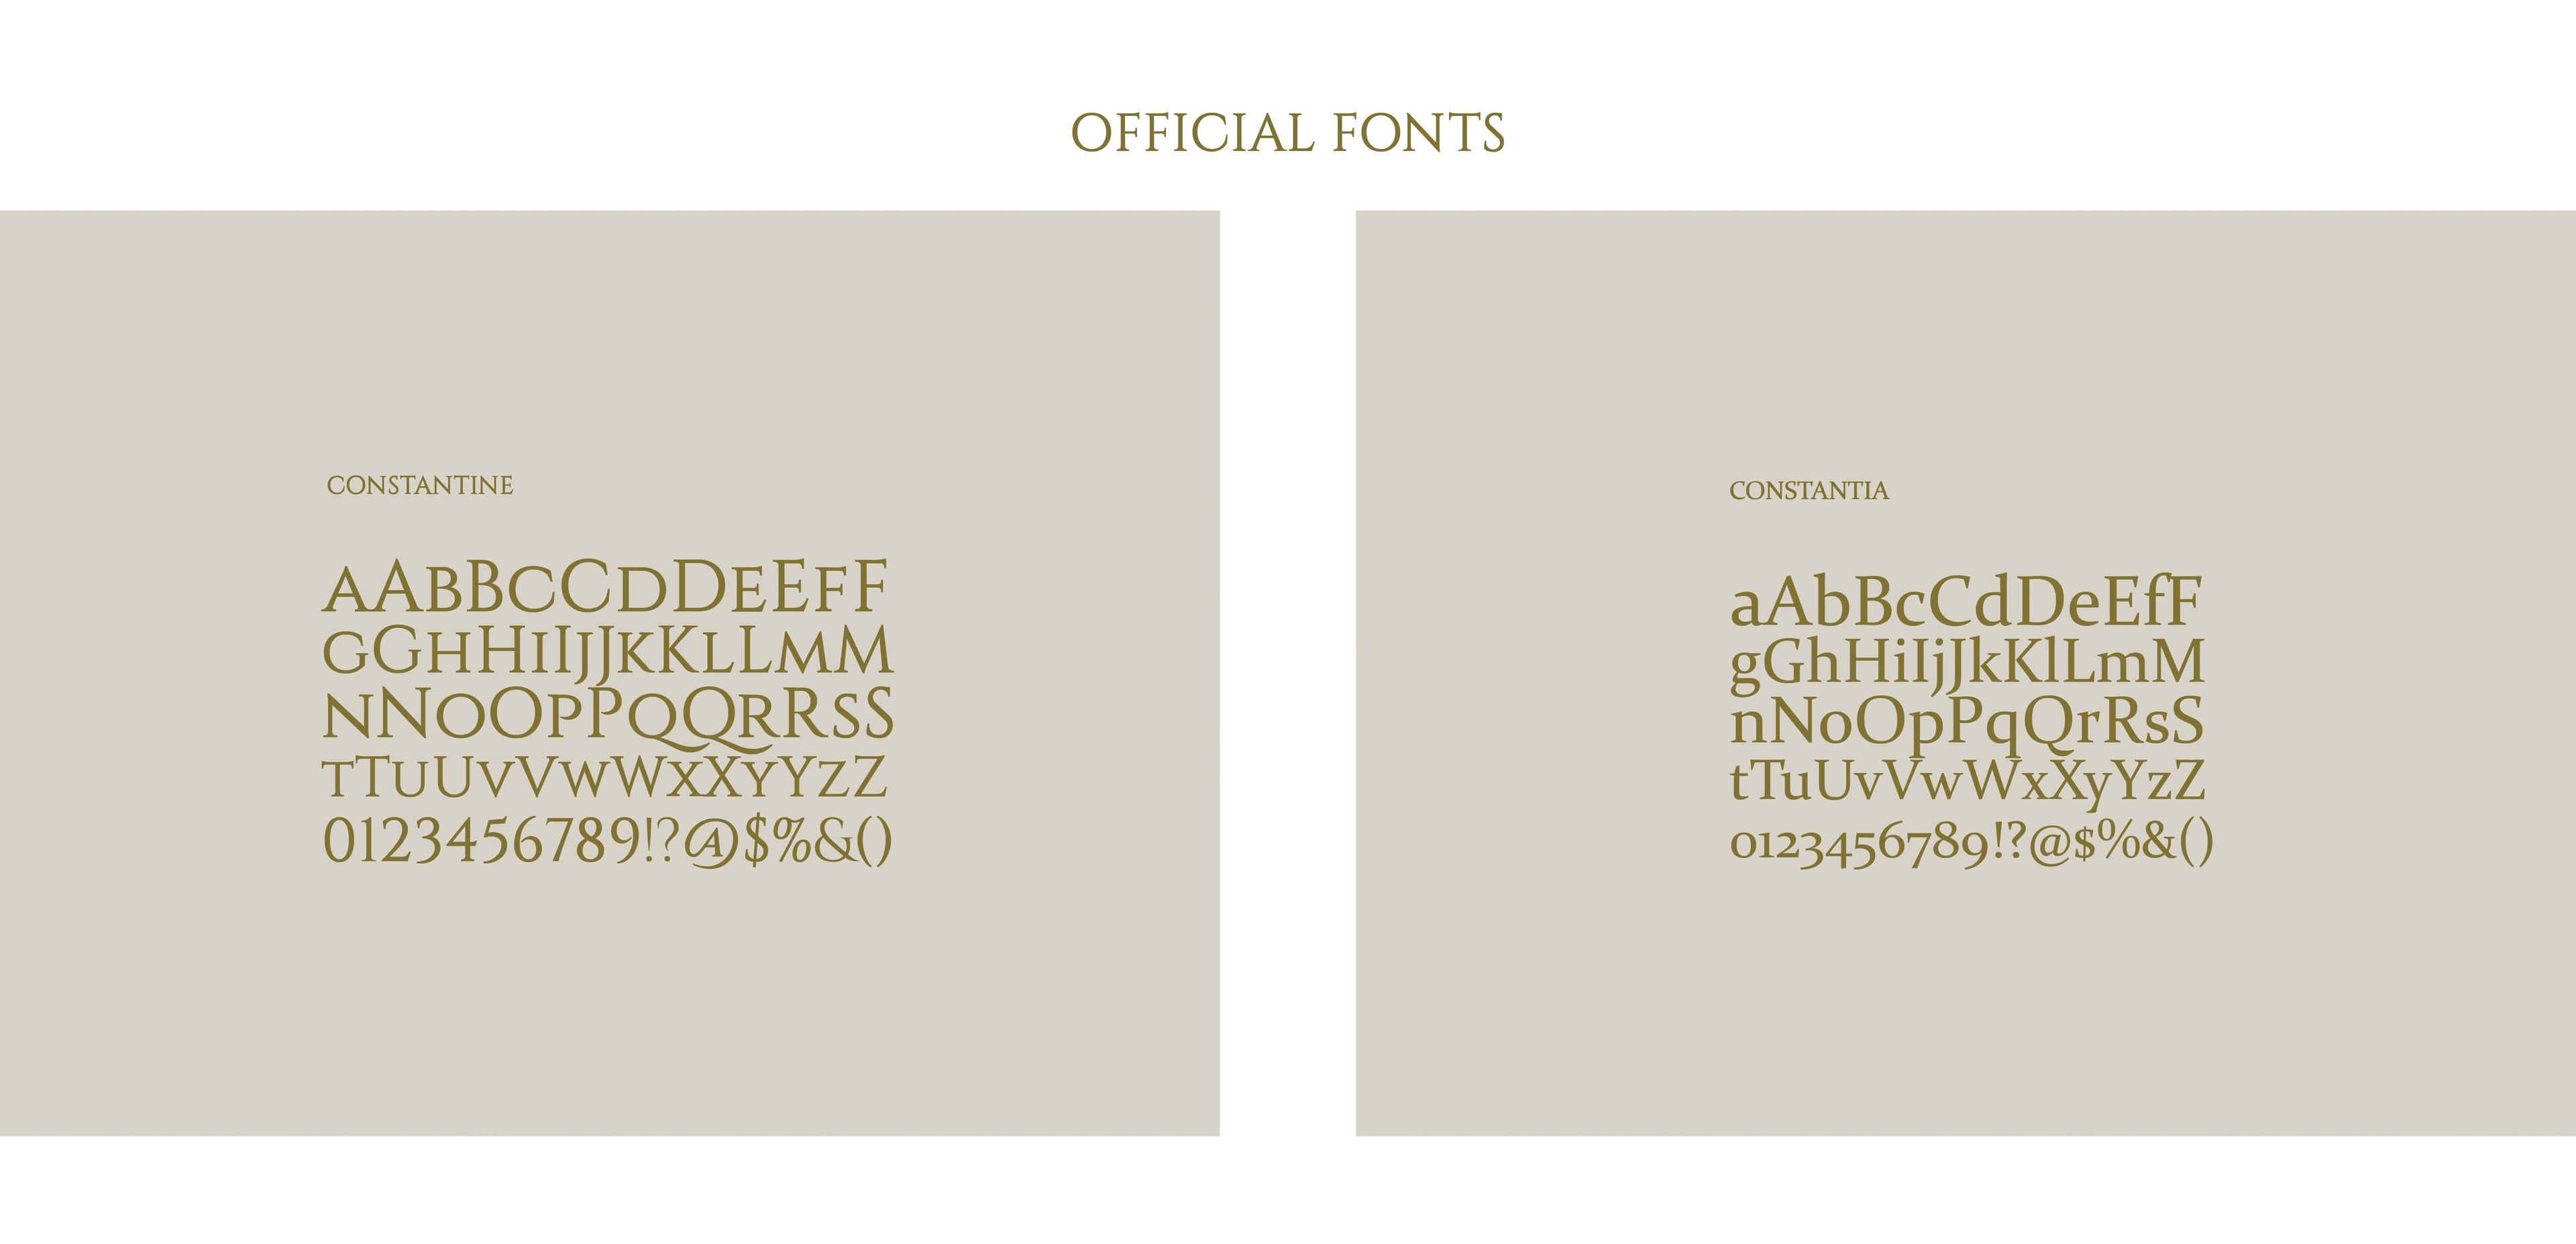 Official Fonts: Constantine & Constantia